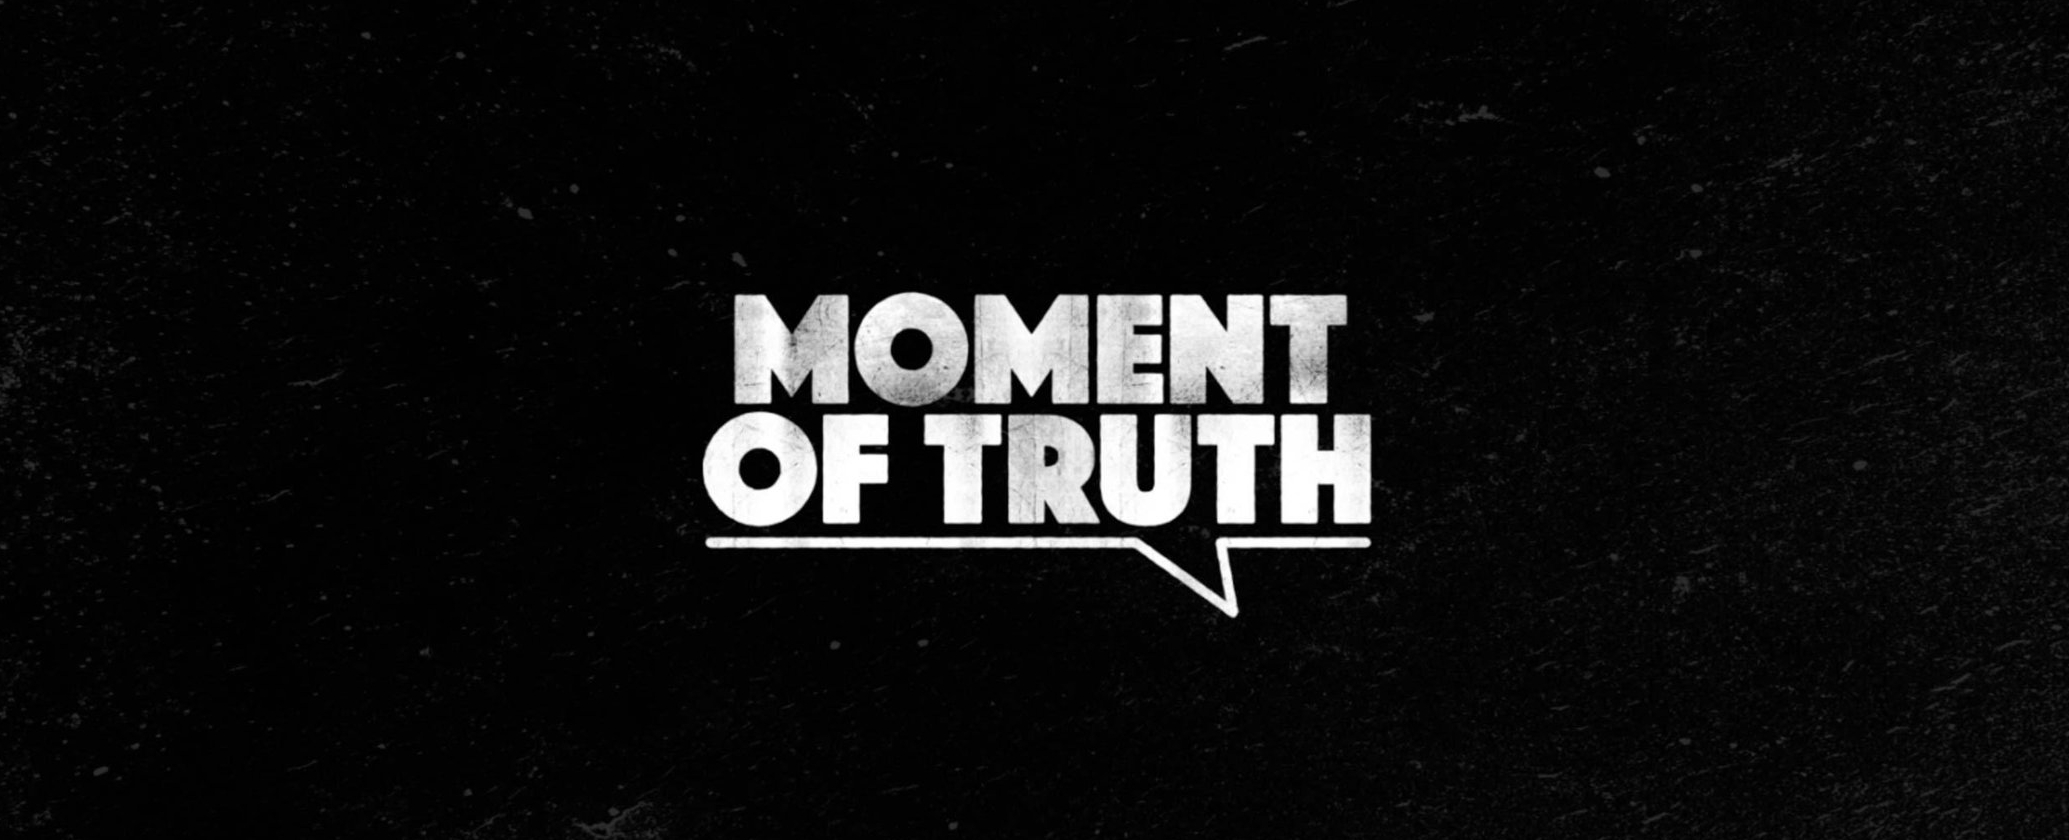 onaudiopost/momentoftruth